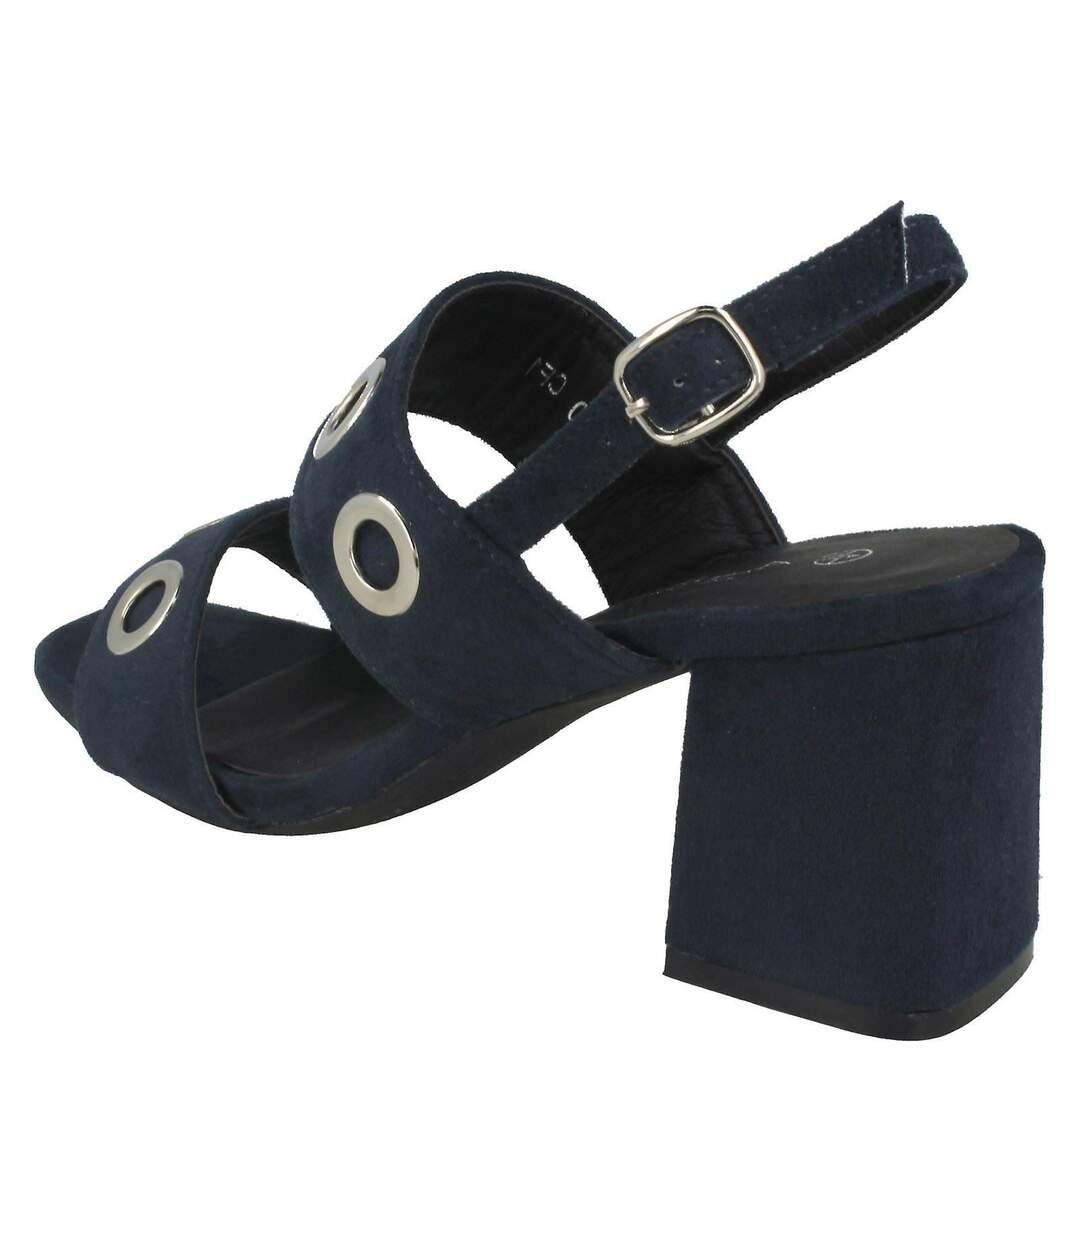 Grande Vente Anne Michelle Mid Heel Chaussures À Œillets Femme Bleu marine UTKM503 dsf.d455nksdKLFHG